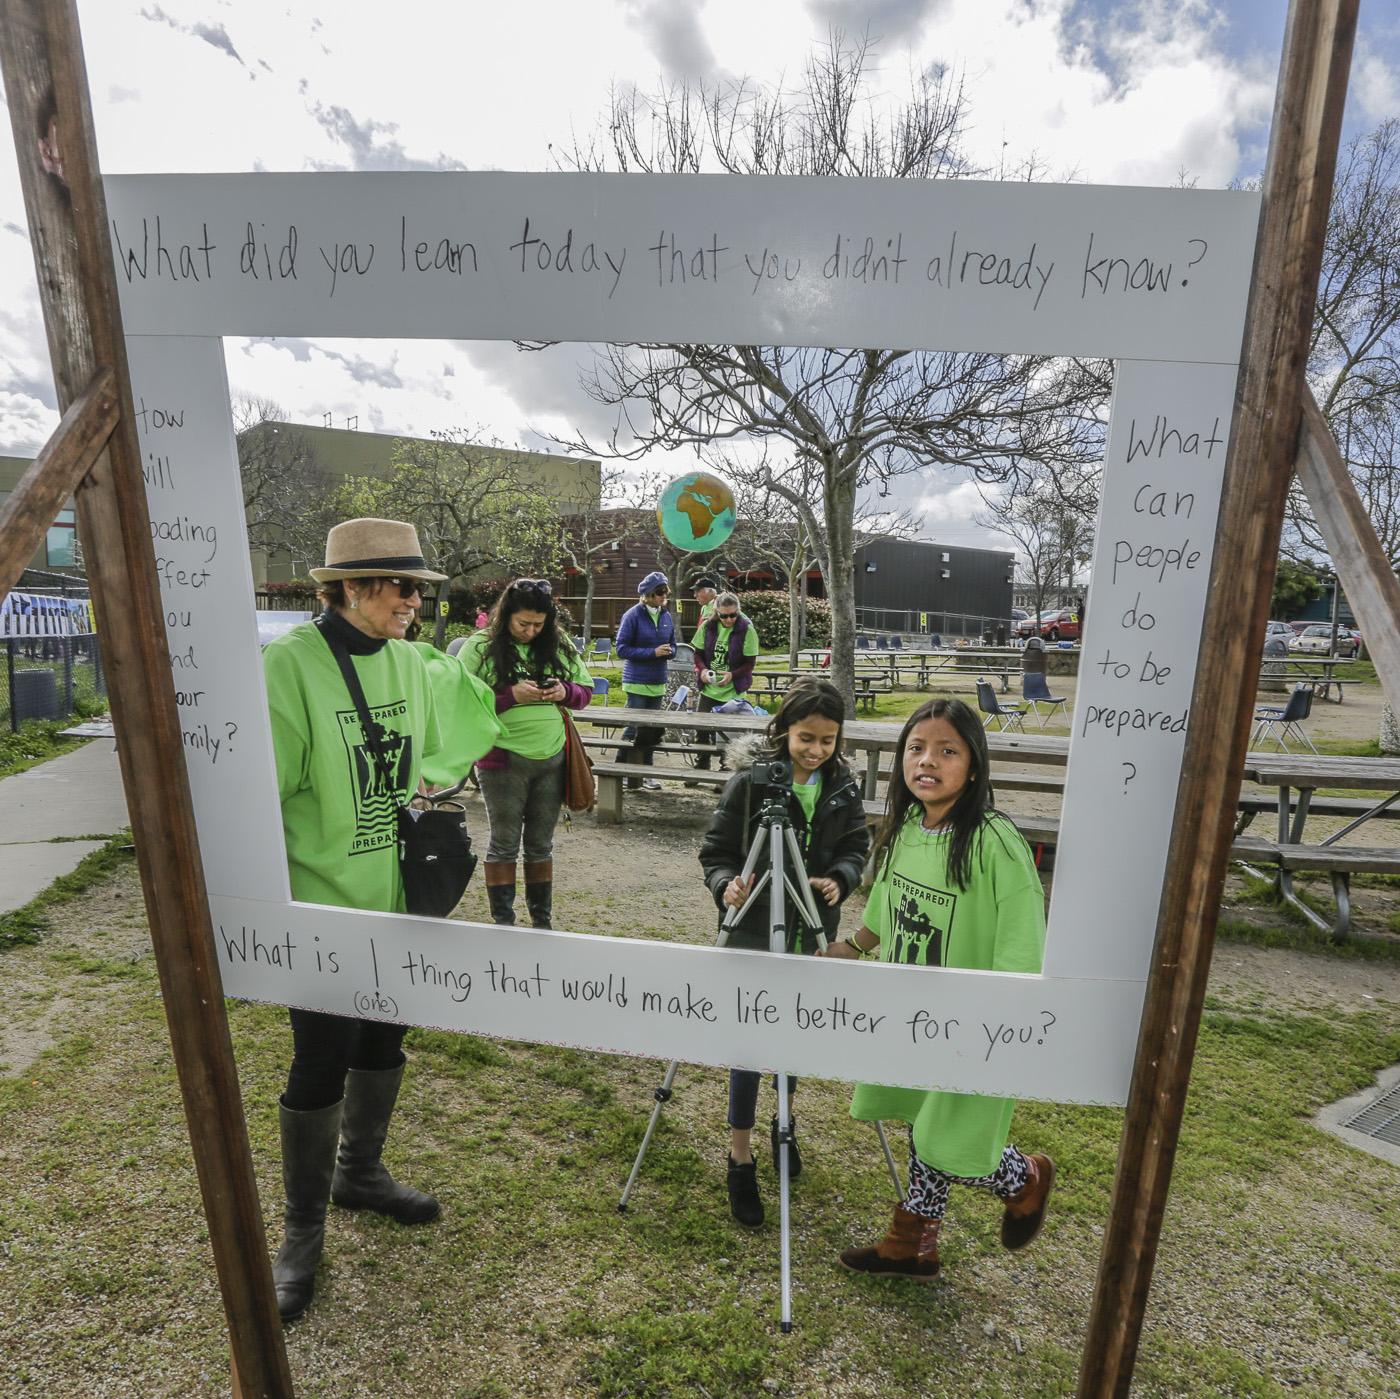 Interviews by Y-PLAN San Rafael Students at Flood Fair - April 4, 2018